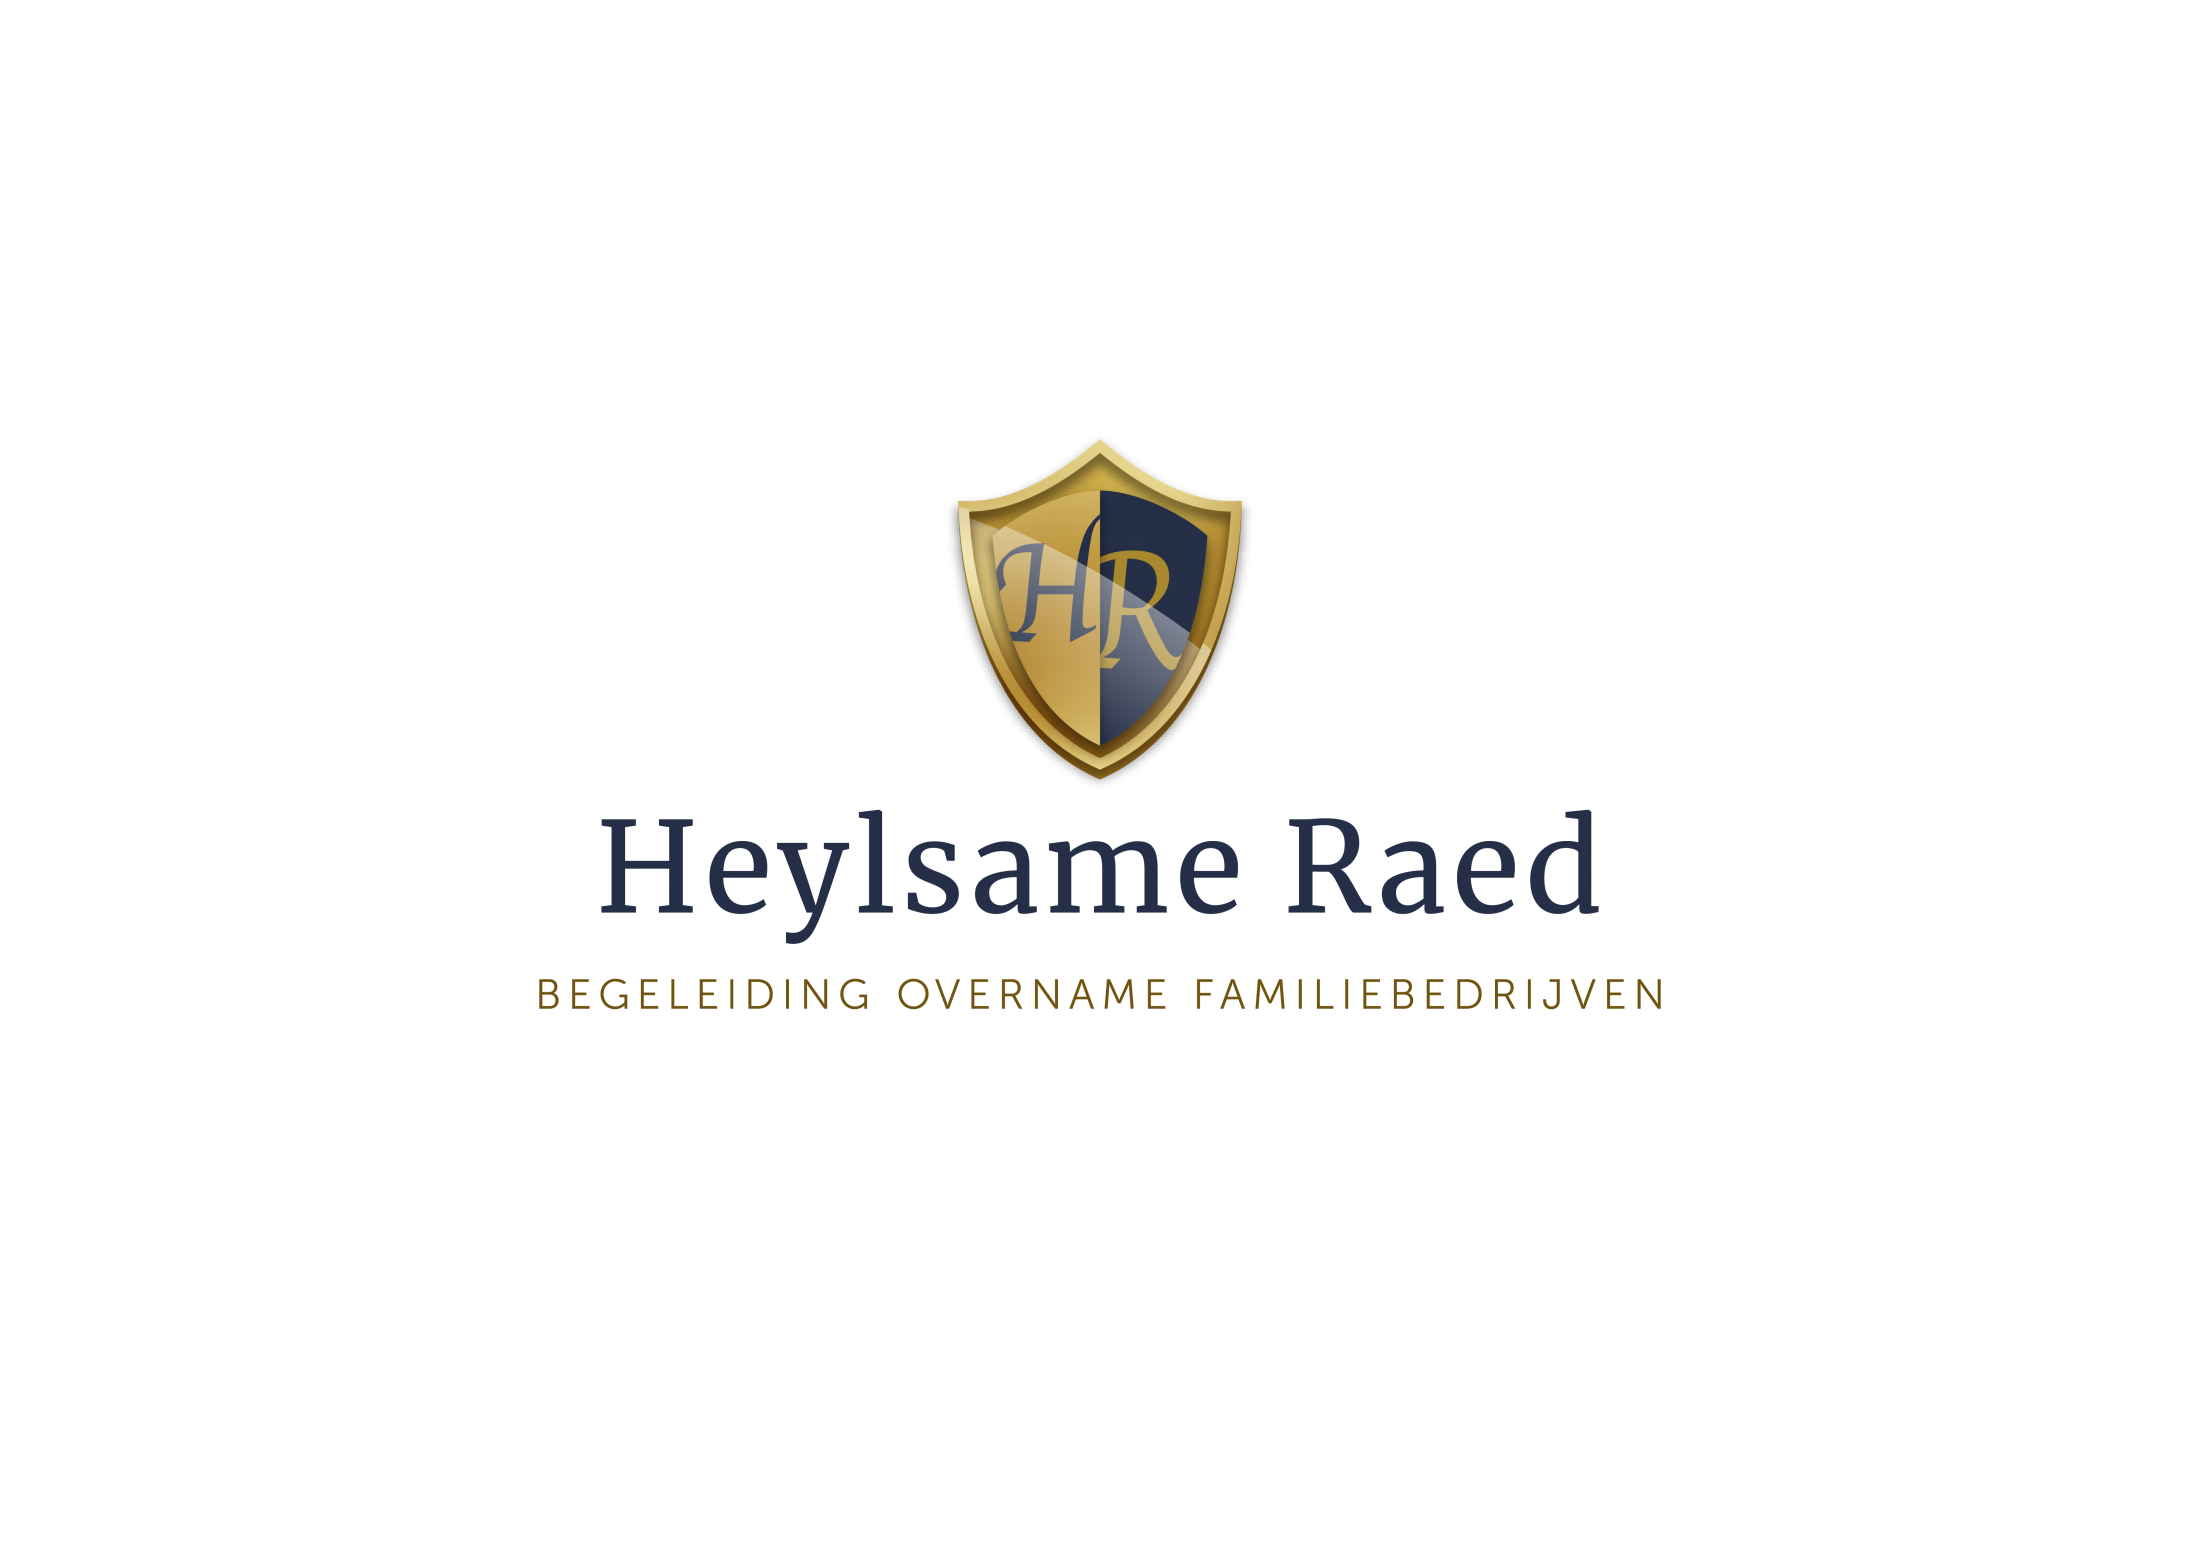 familiebedrijf-overname-adviseur-heylsameraed-logo-payoff-8x